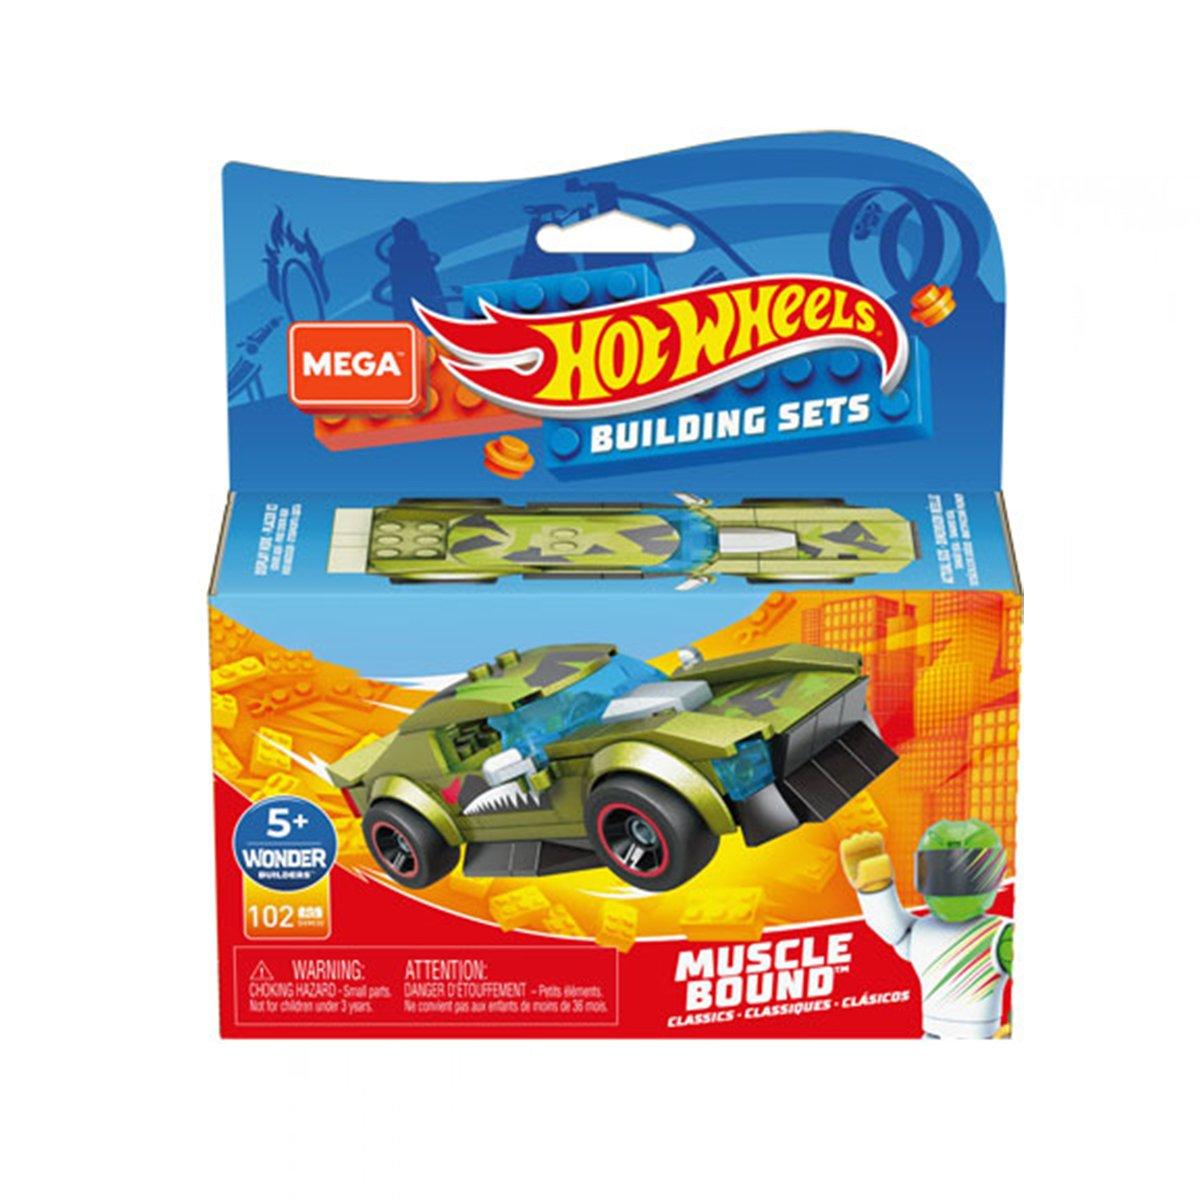 Masinuta Hot Wheels, MegaConstrux, Rockin Racers, GVM30